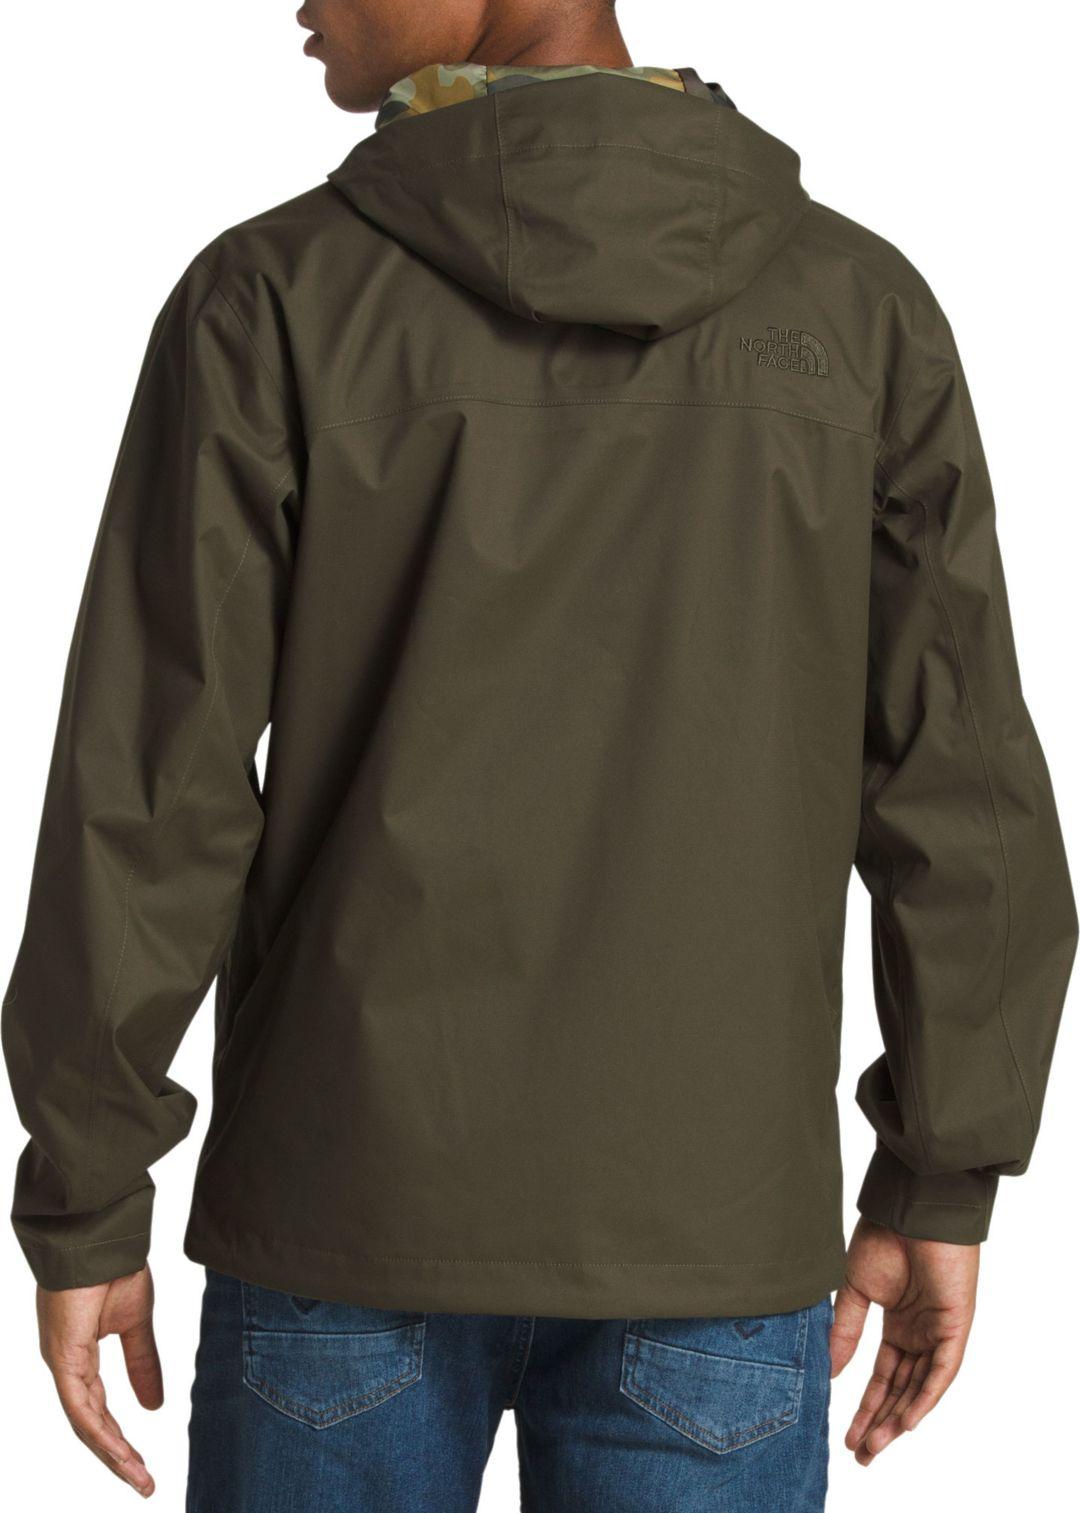 ad312467b The North Face Men's Millerton Rain Jacket